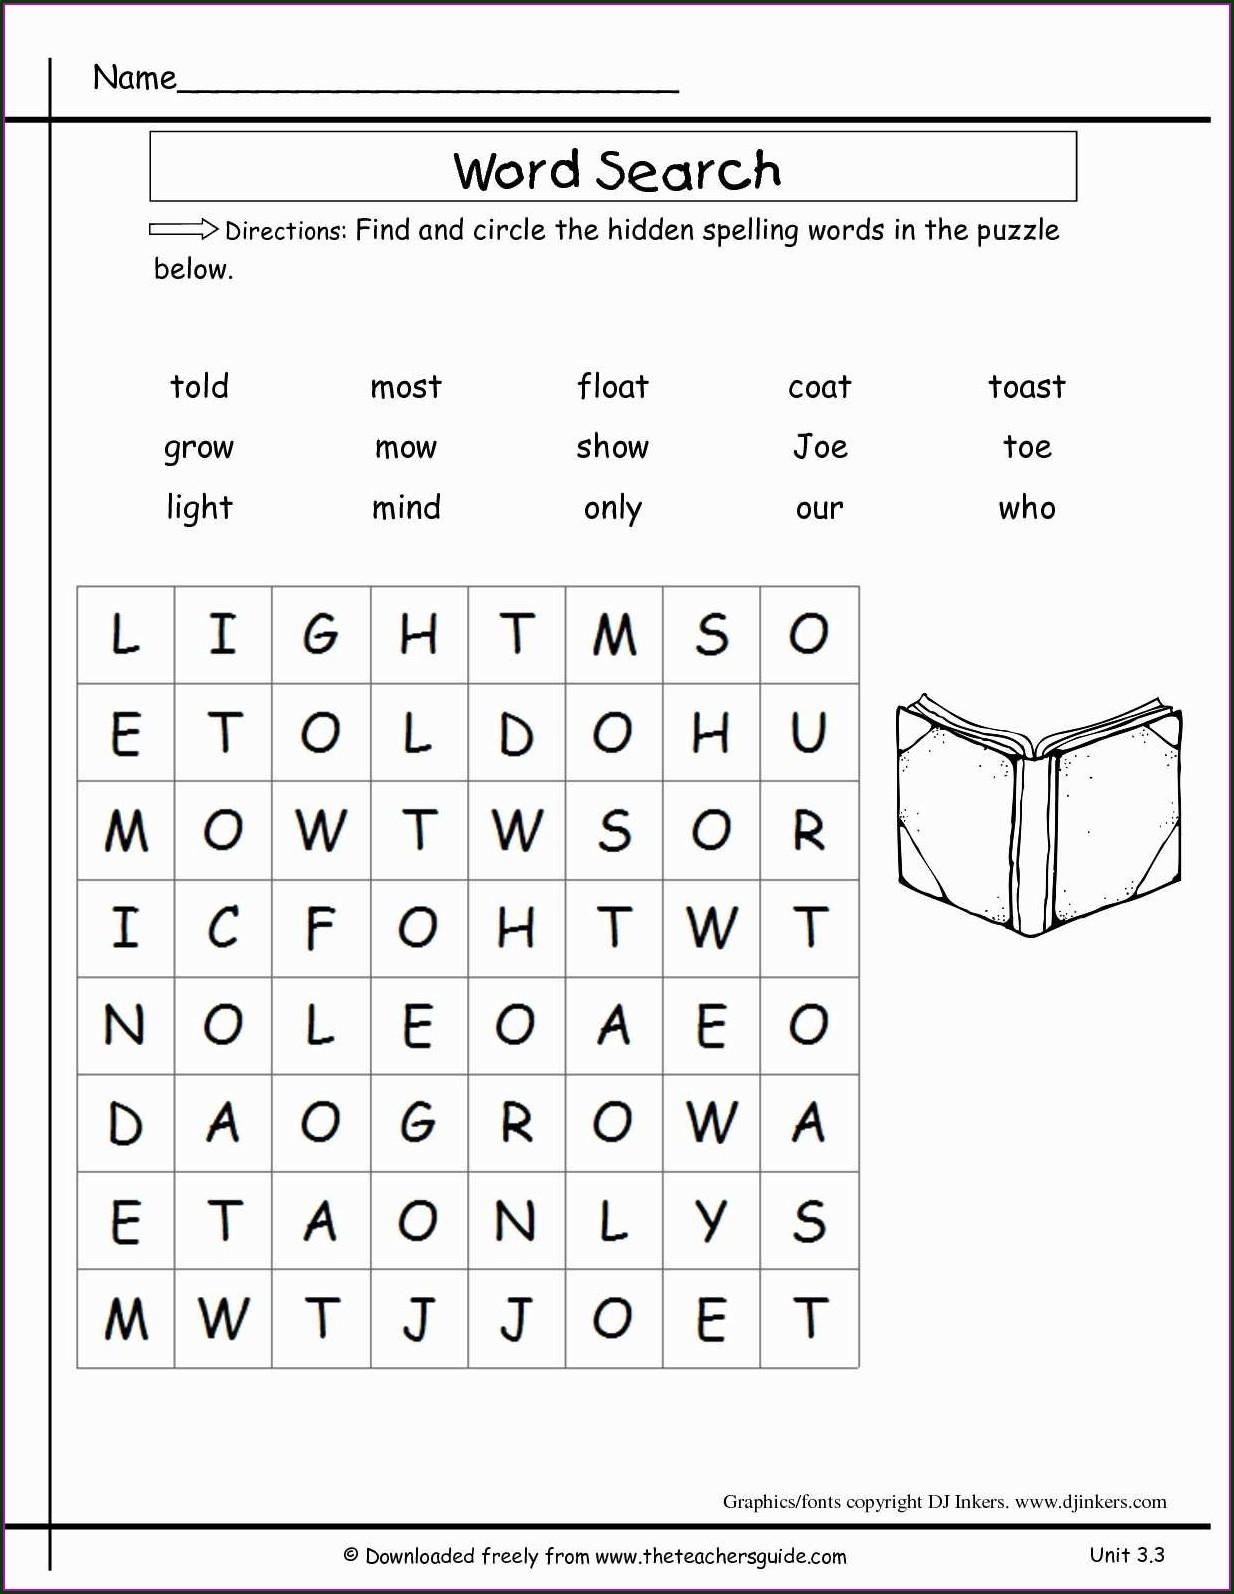 Worksheet On Sight Words For Grade 1